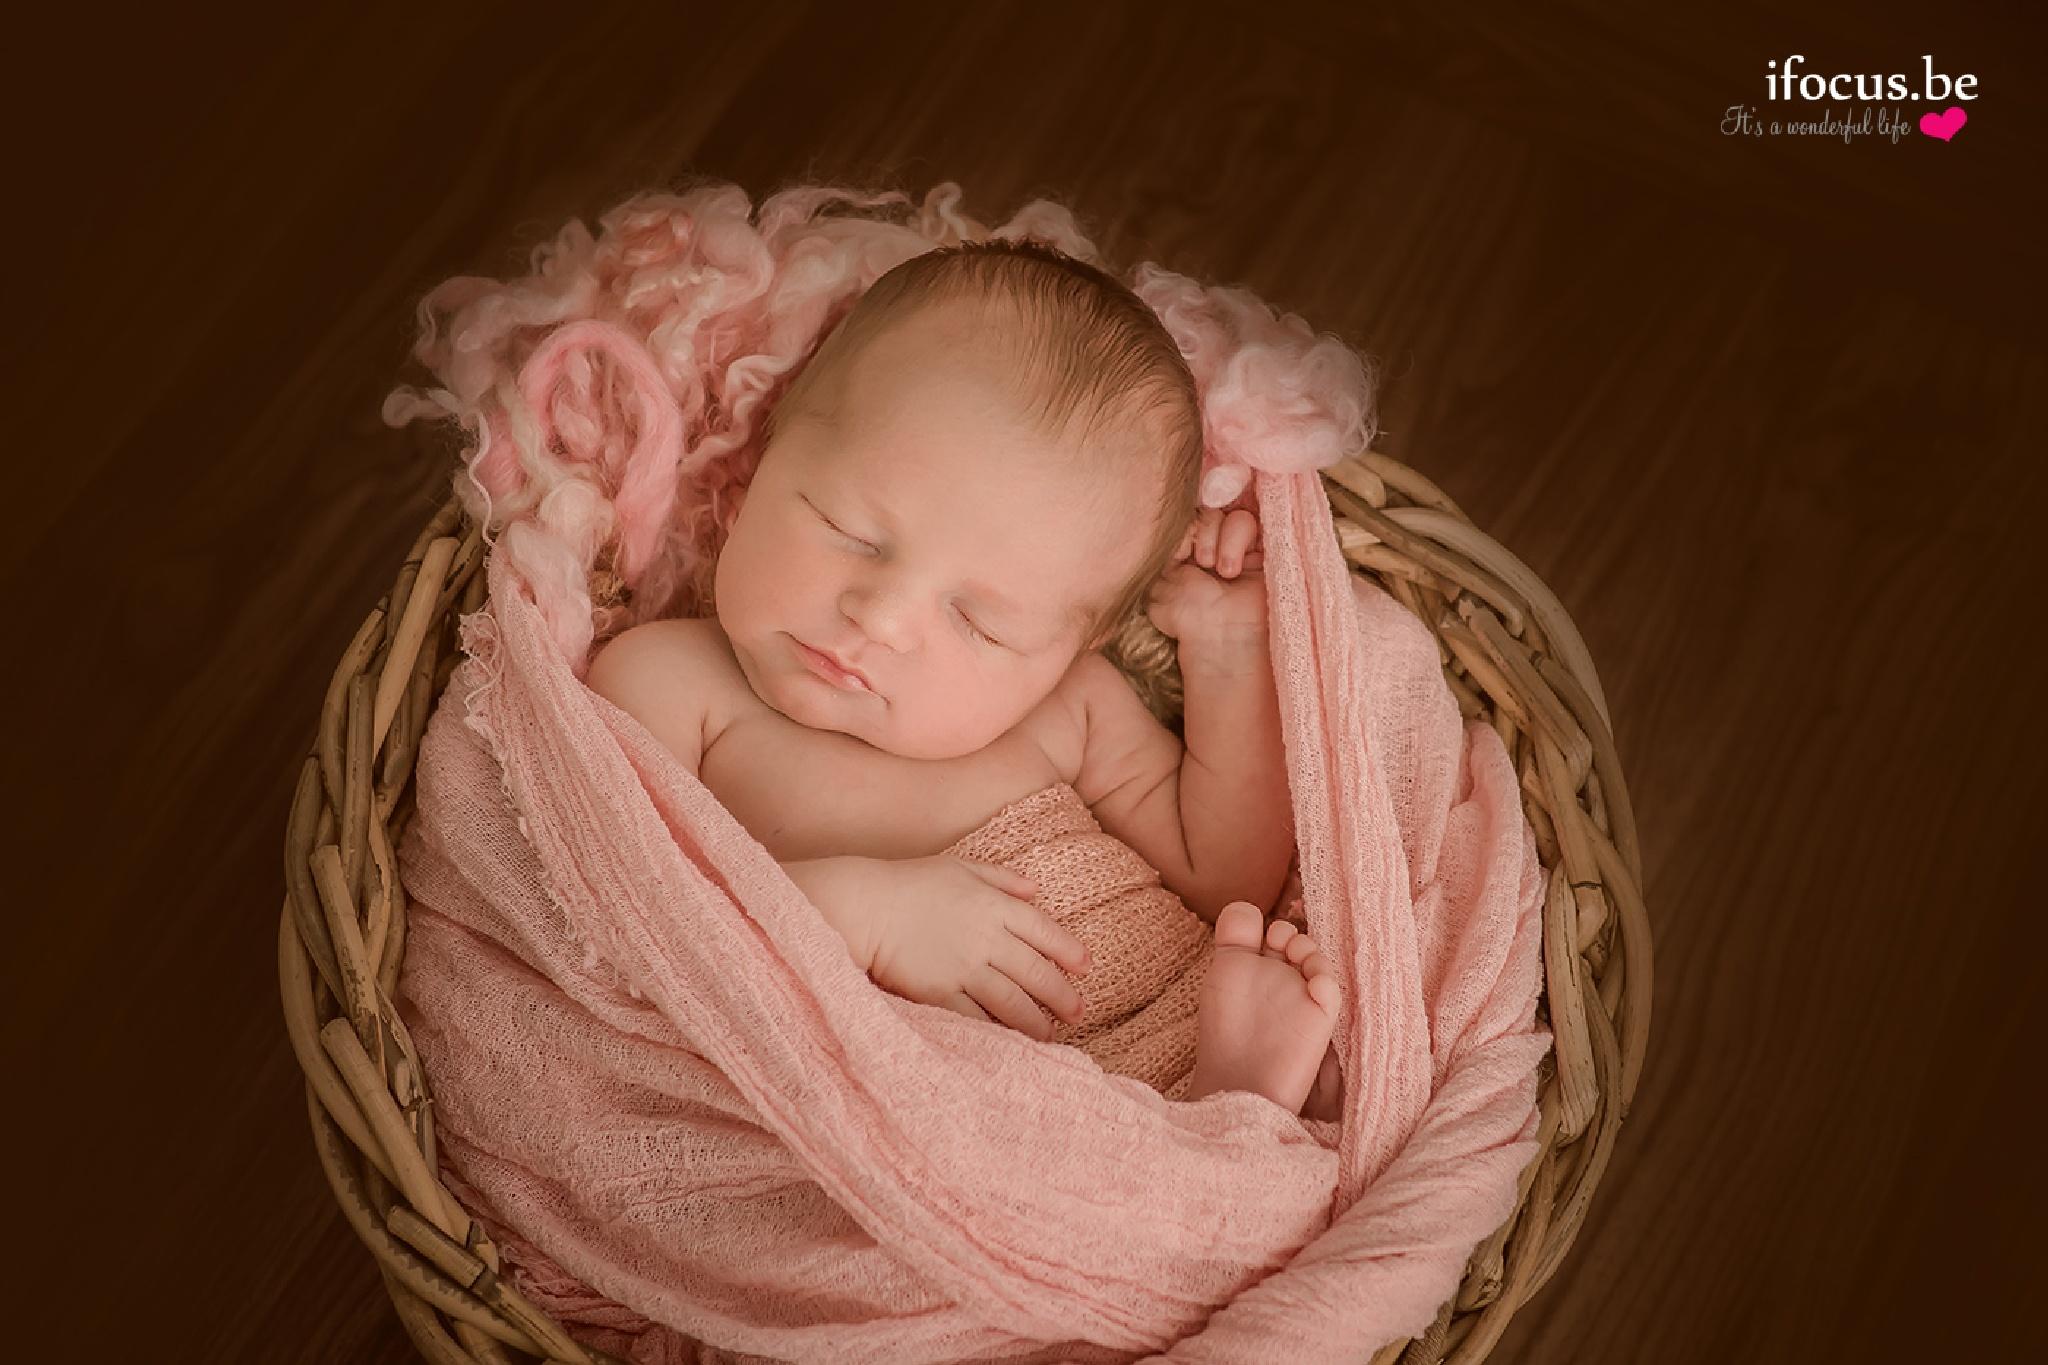 Newborn girl in pink by ifocus